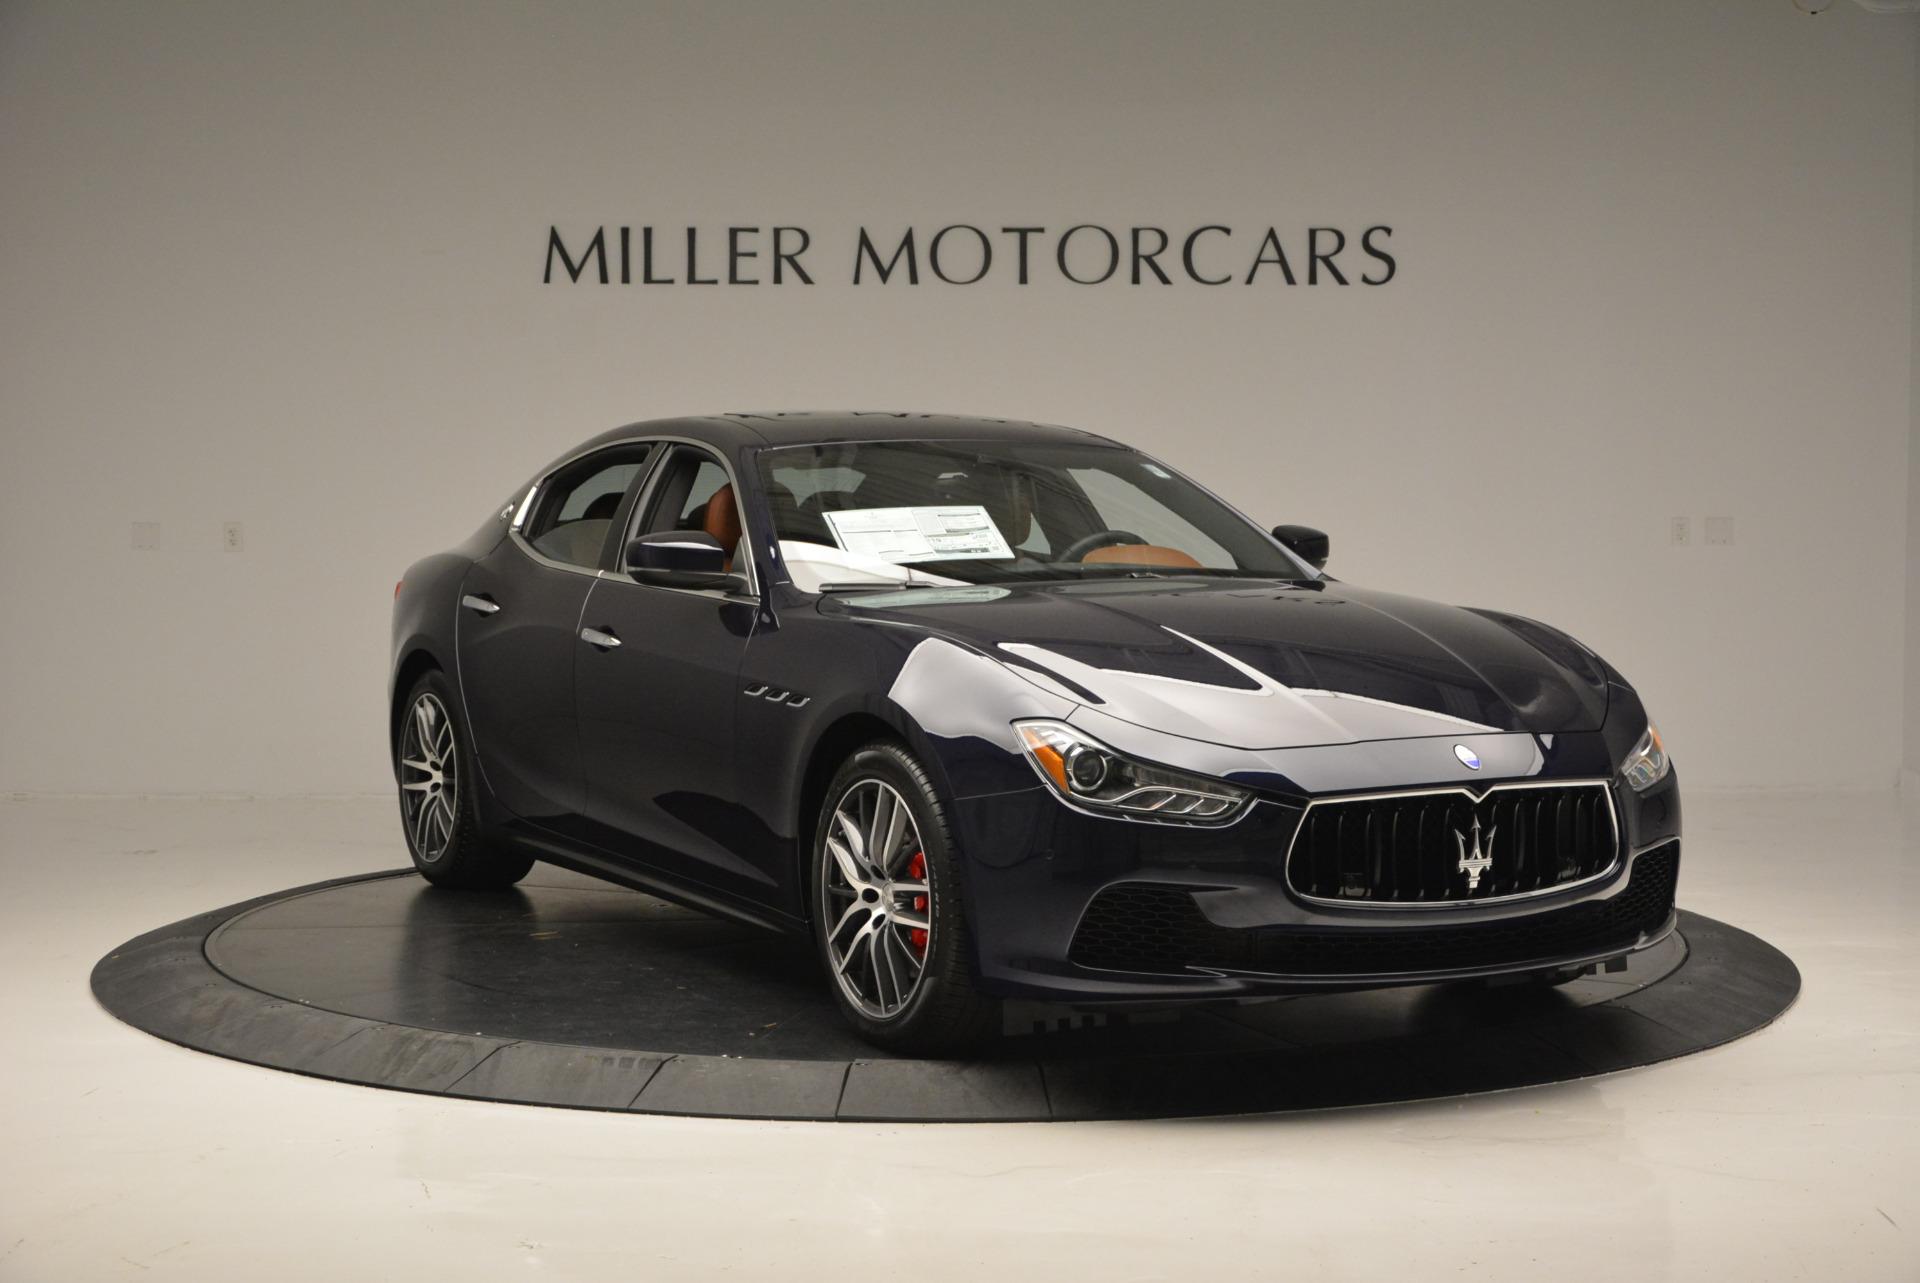 Used 2017 Maserati Ghibli S Q4 - EX Loaner For Sale In Greenwich, CT. Alfa Romeo of Greenwich, M1662 568_p11